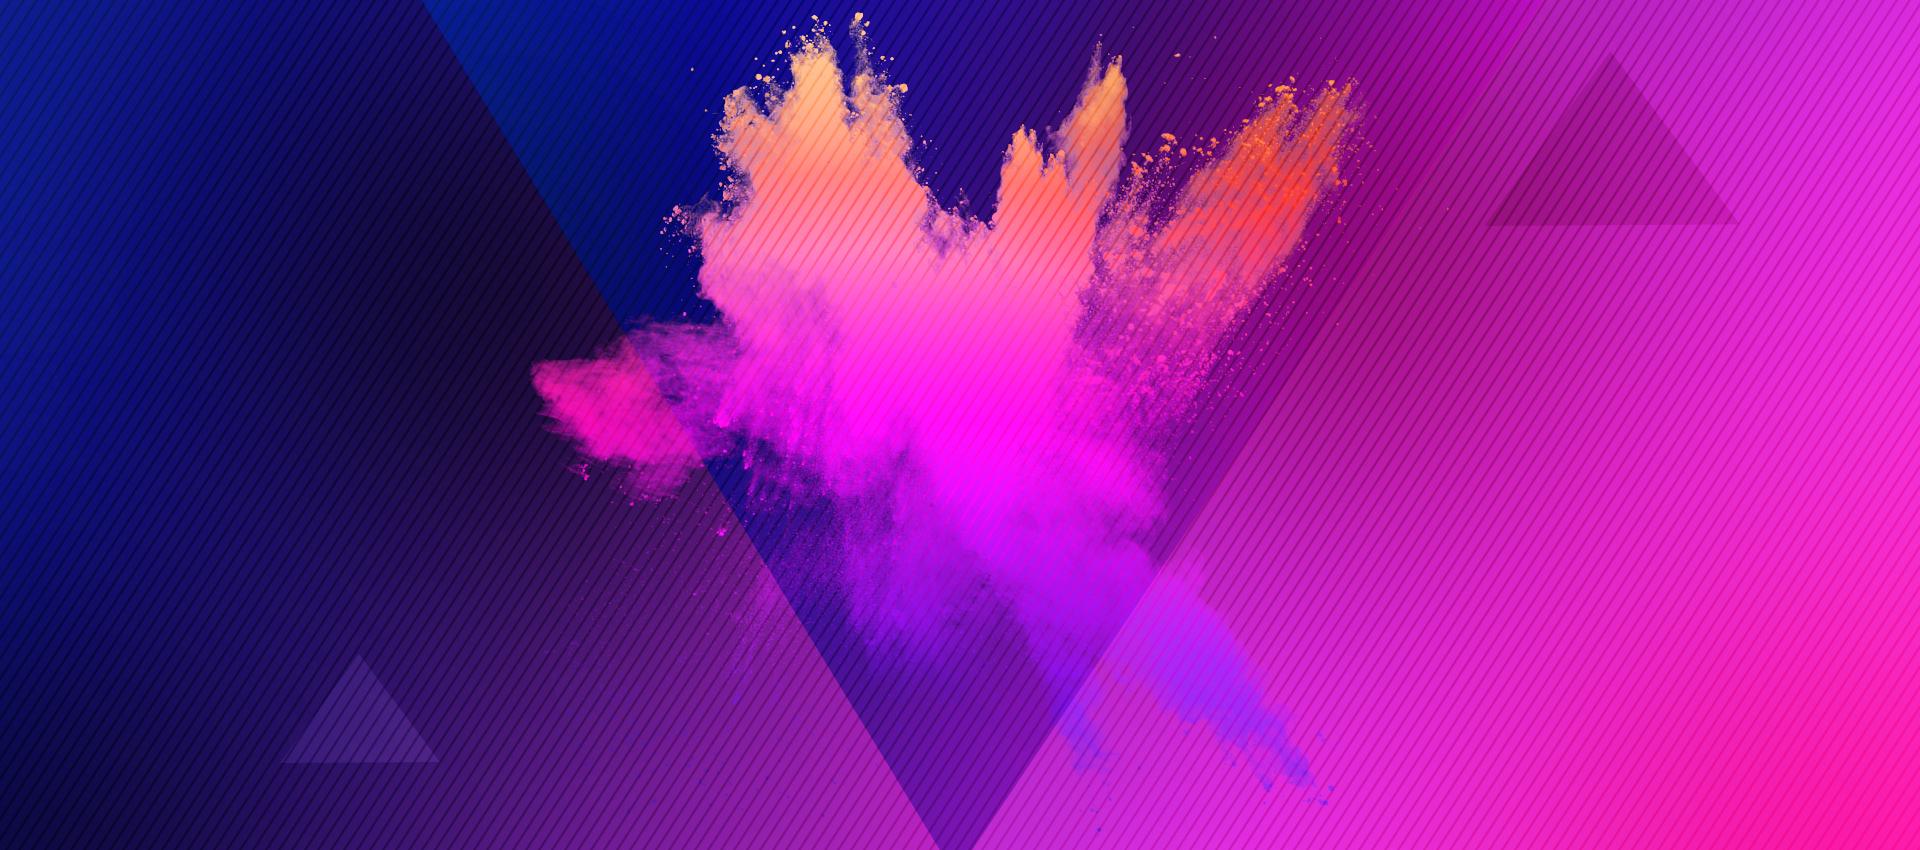 Purple Geometric Gra Nt Electricity Purple Geometric